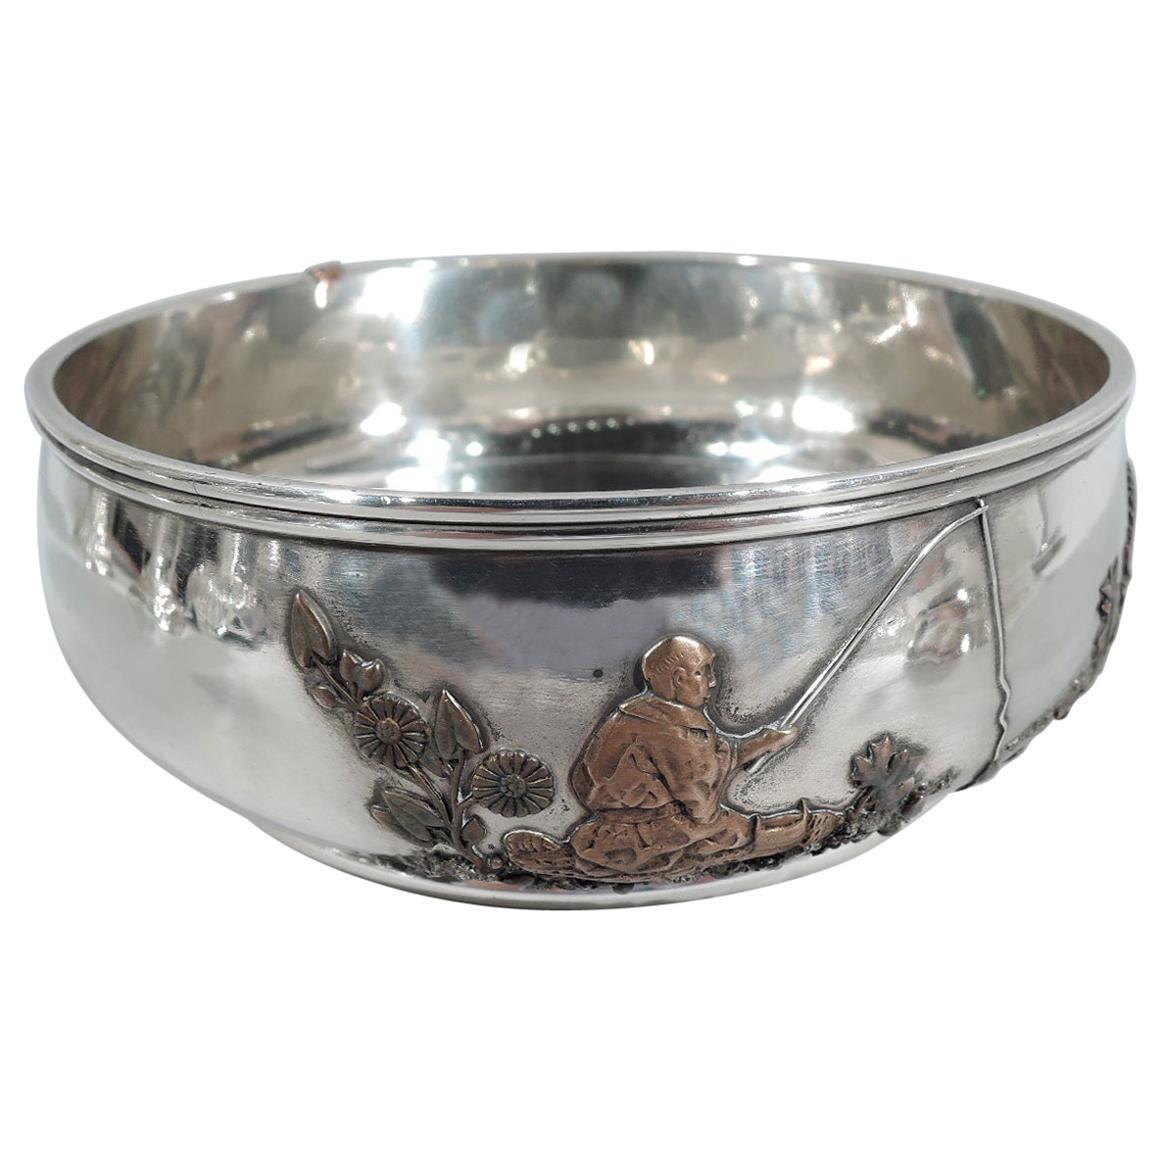 Gorham Japonesque Mixed Metal & Sterling Silver Fisherman Bowl